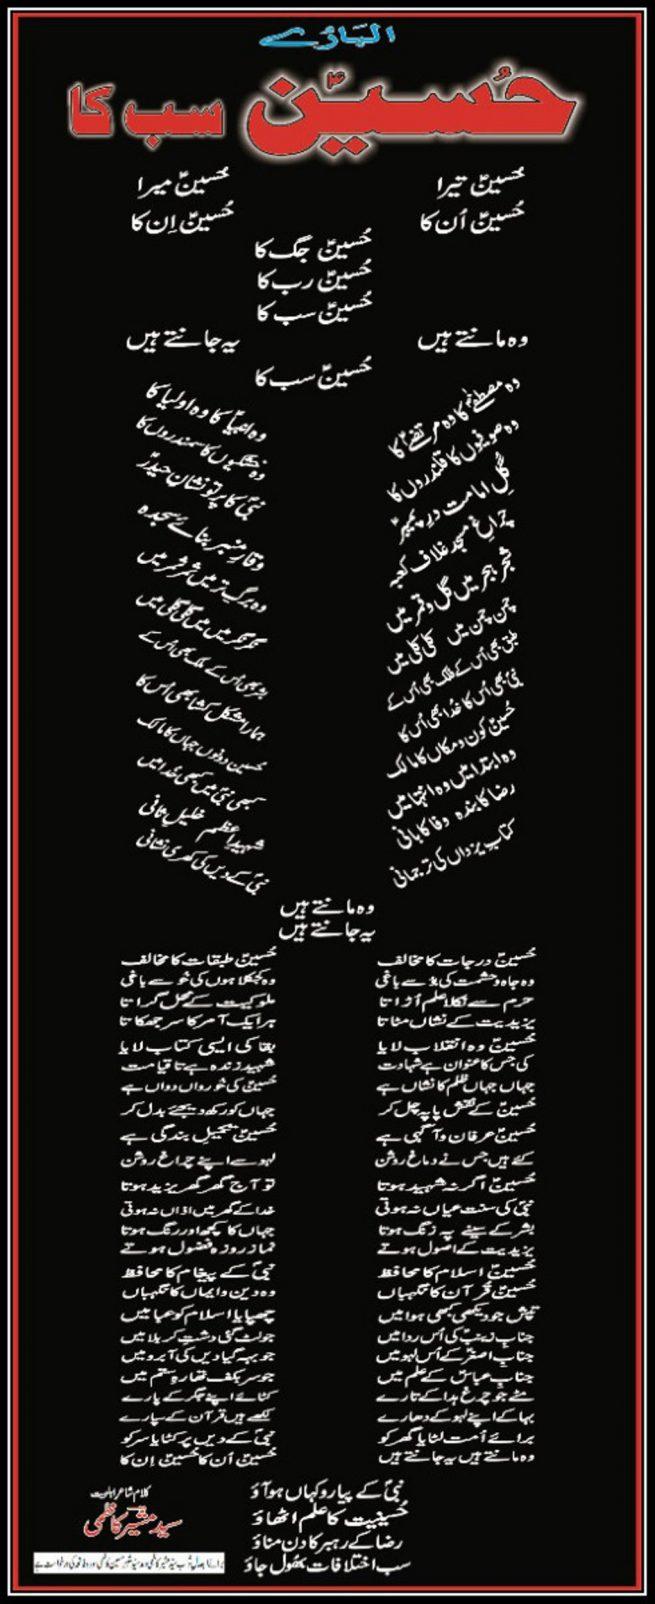 Hussain Sab ka by Musheer Kazmi